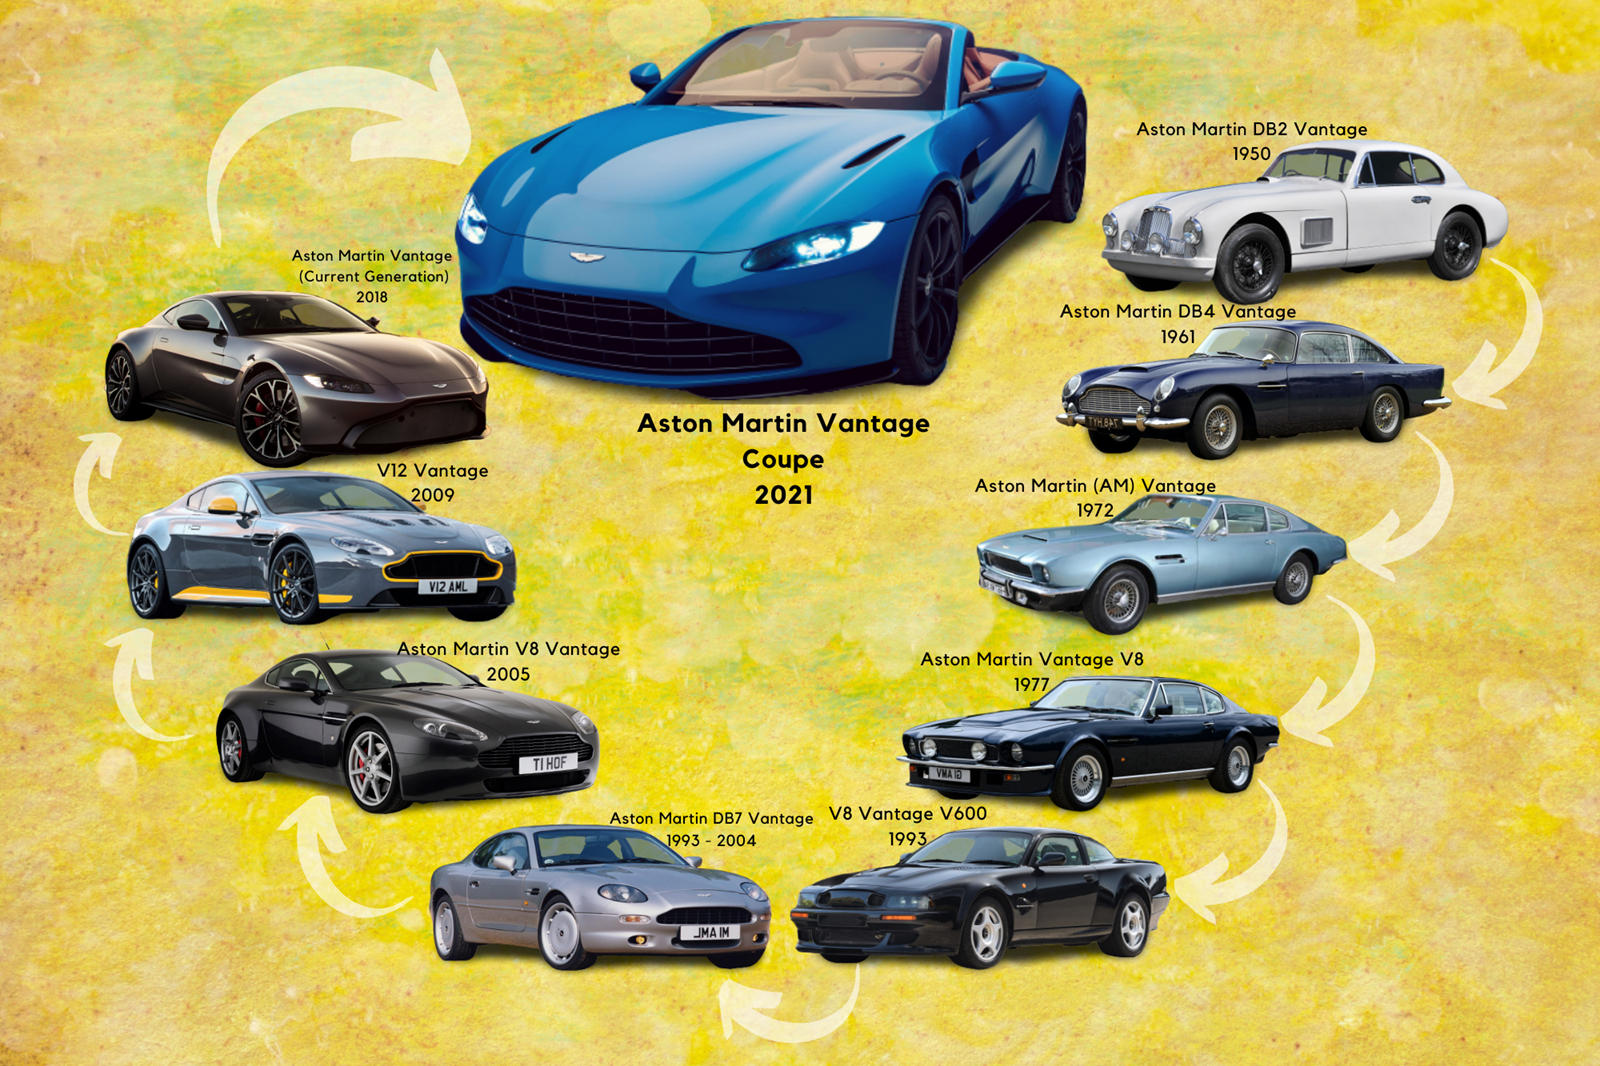 History Of The Aston Martin Vantage